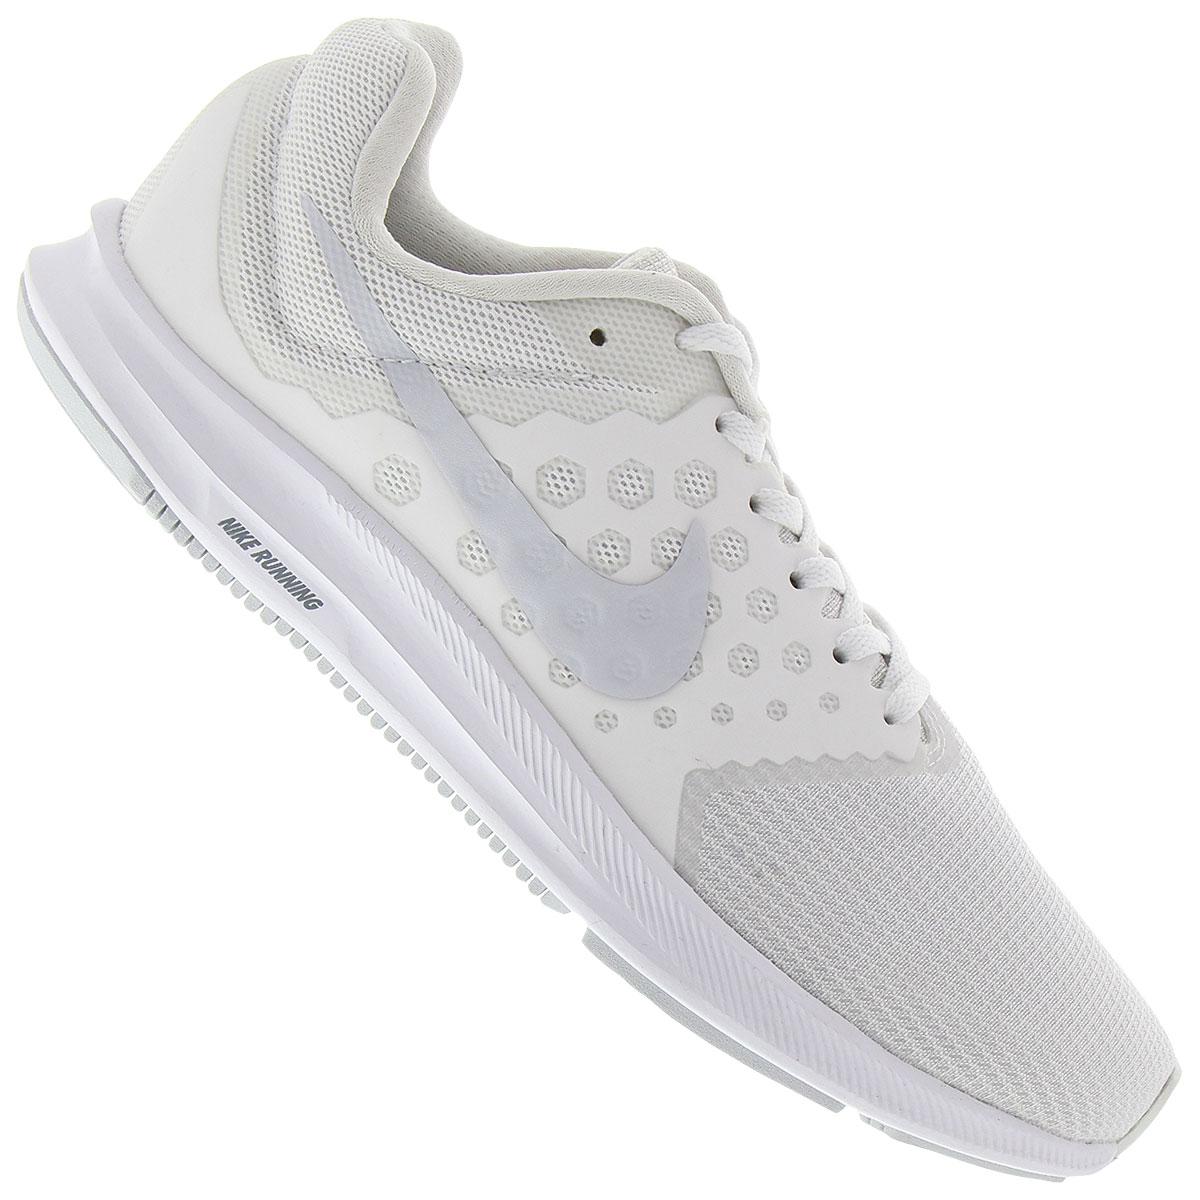 Tênis Nike Downshifter 7 - Masculino 4be417736b181